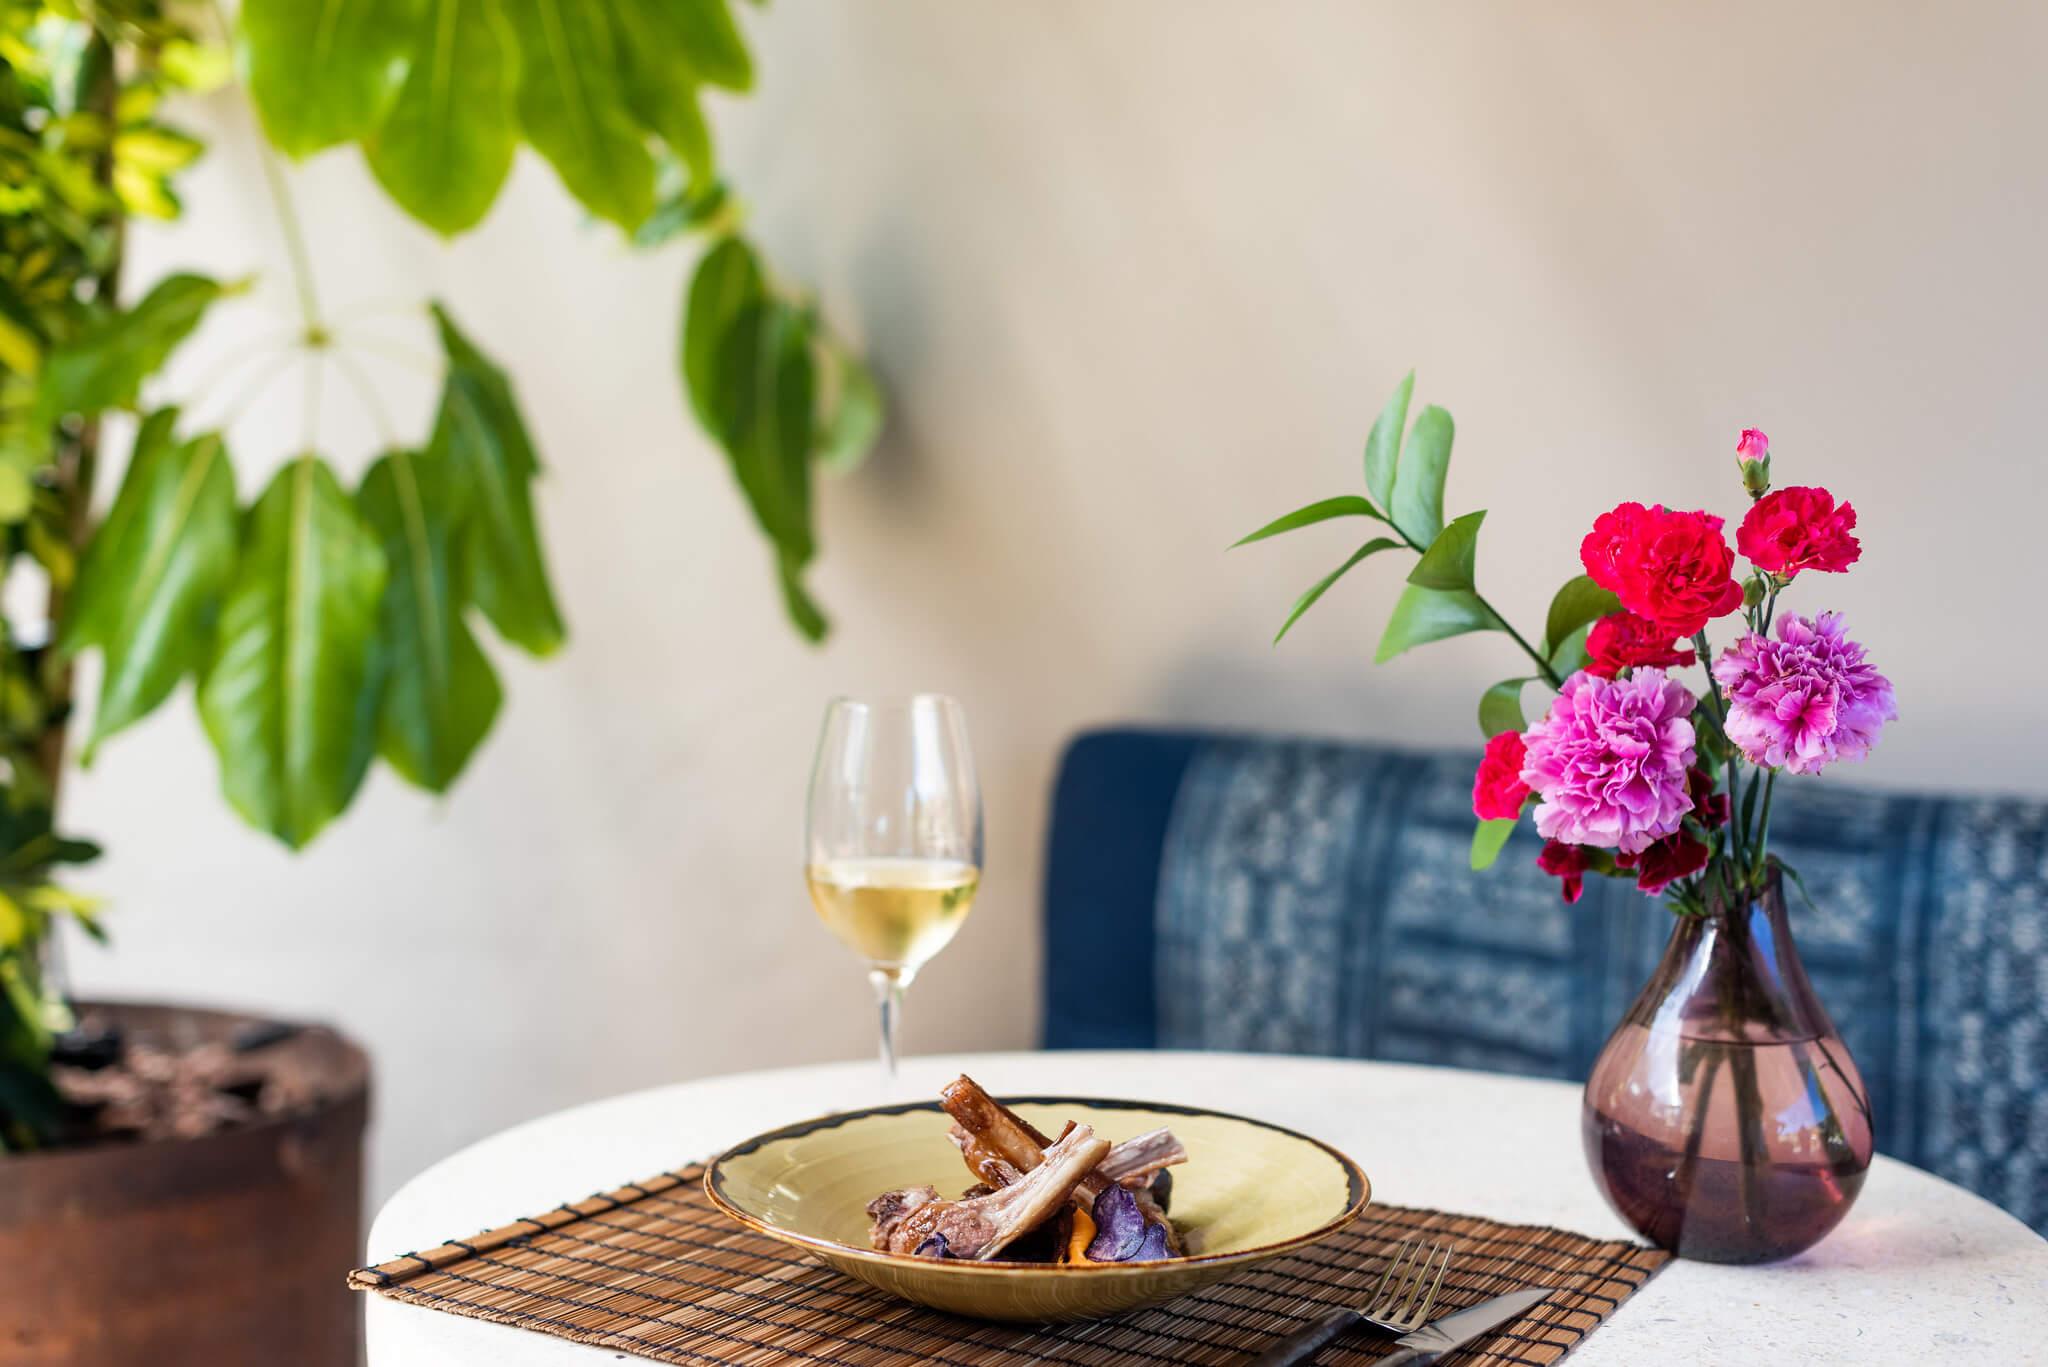 https://www.white-ibiza.com/wp-content/uploads/2020/03/ibiza-restaurants-the-giri-cafe-2020-01.jpg